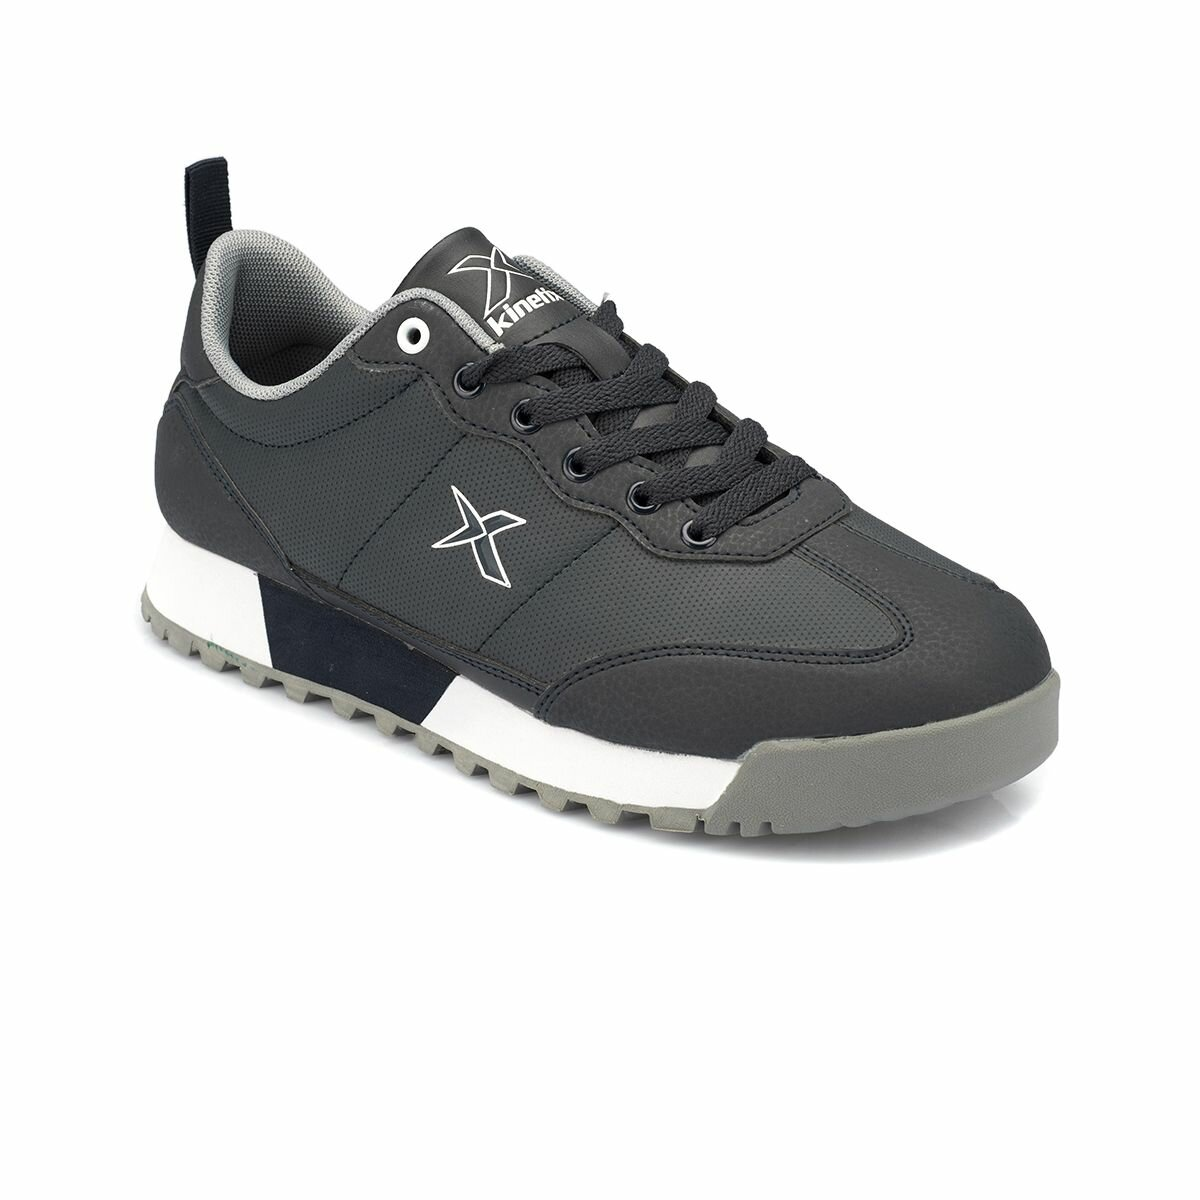 FLO RANK PU M Navy Blue Men 'S Sneaker Shoes KINETIX